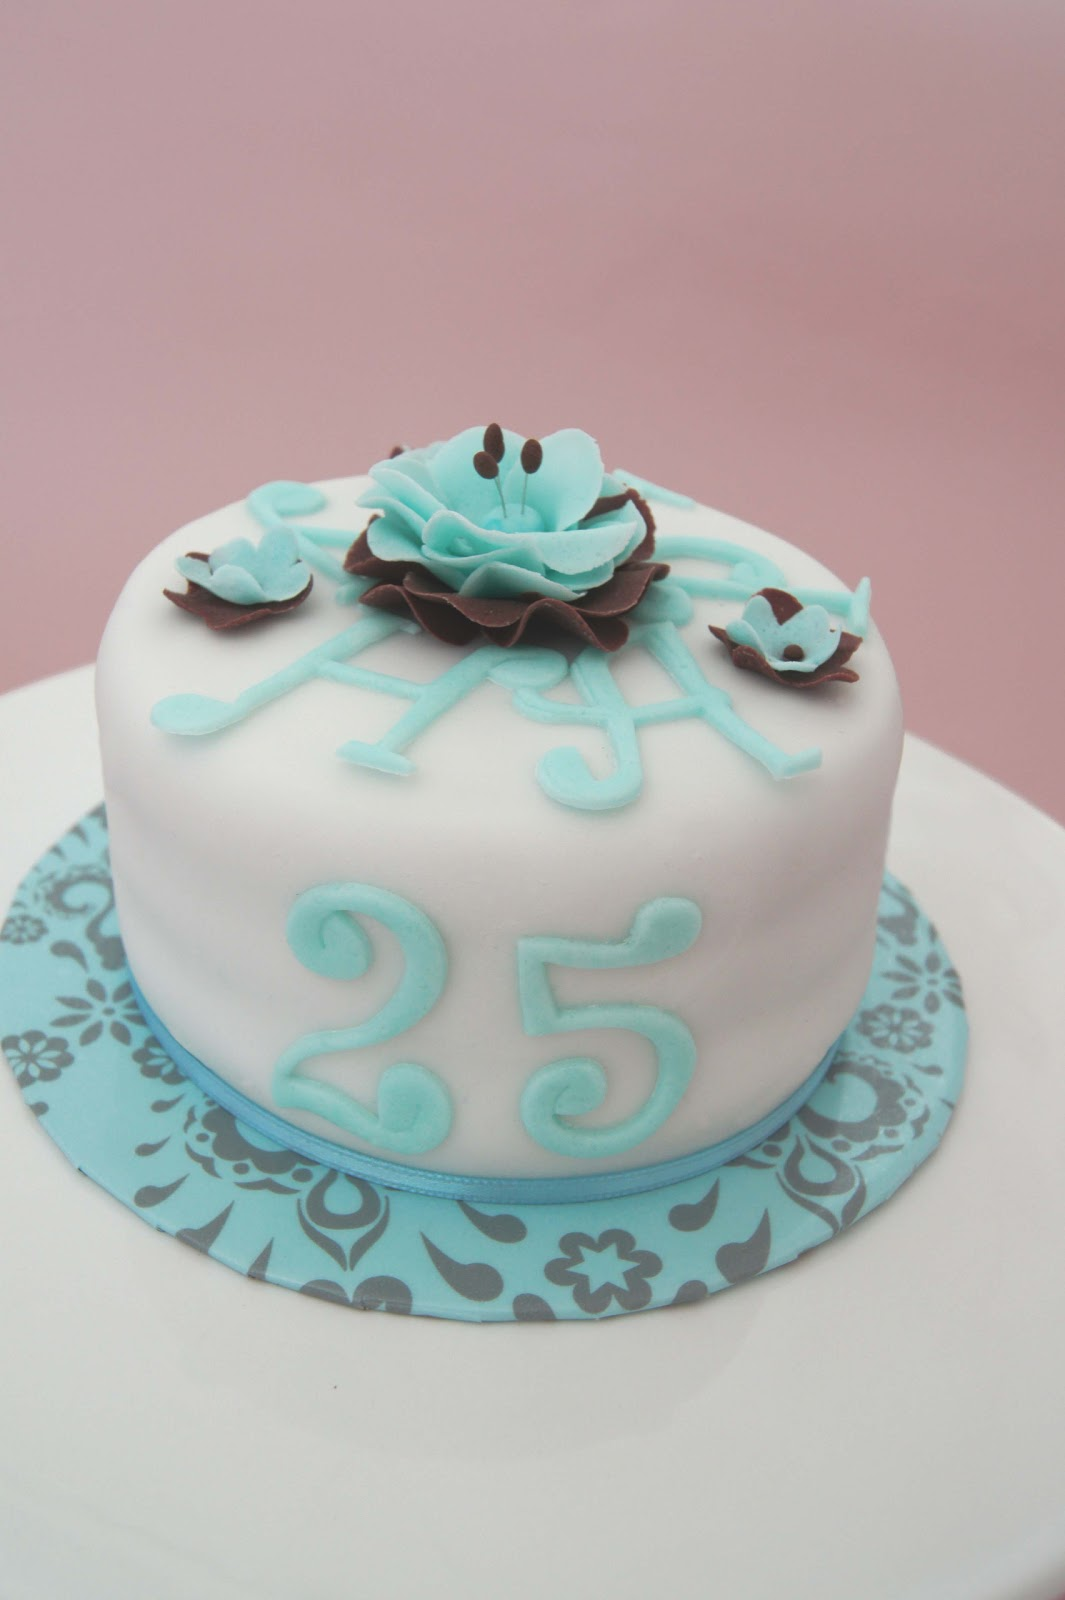 Mokkatorte Zum 25 Geburtstag Top Rezepte